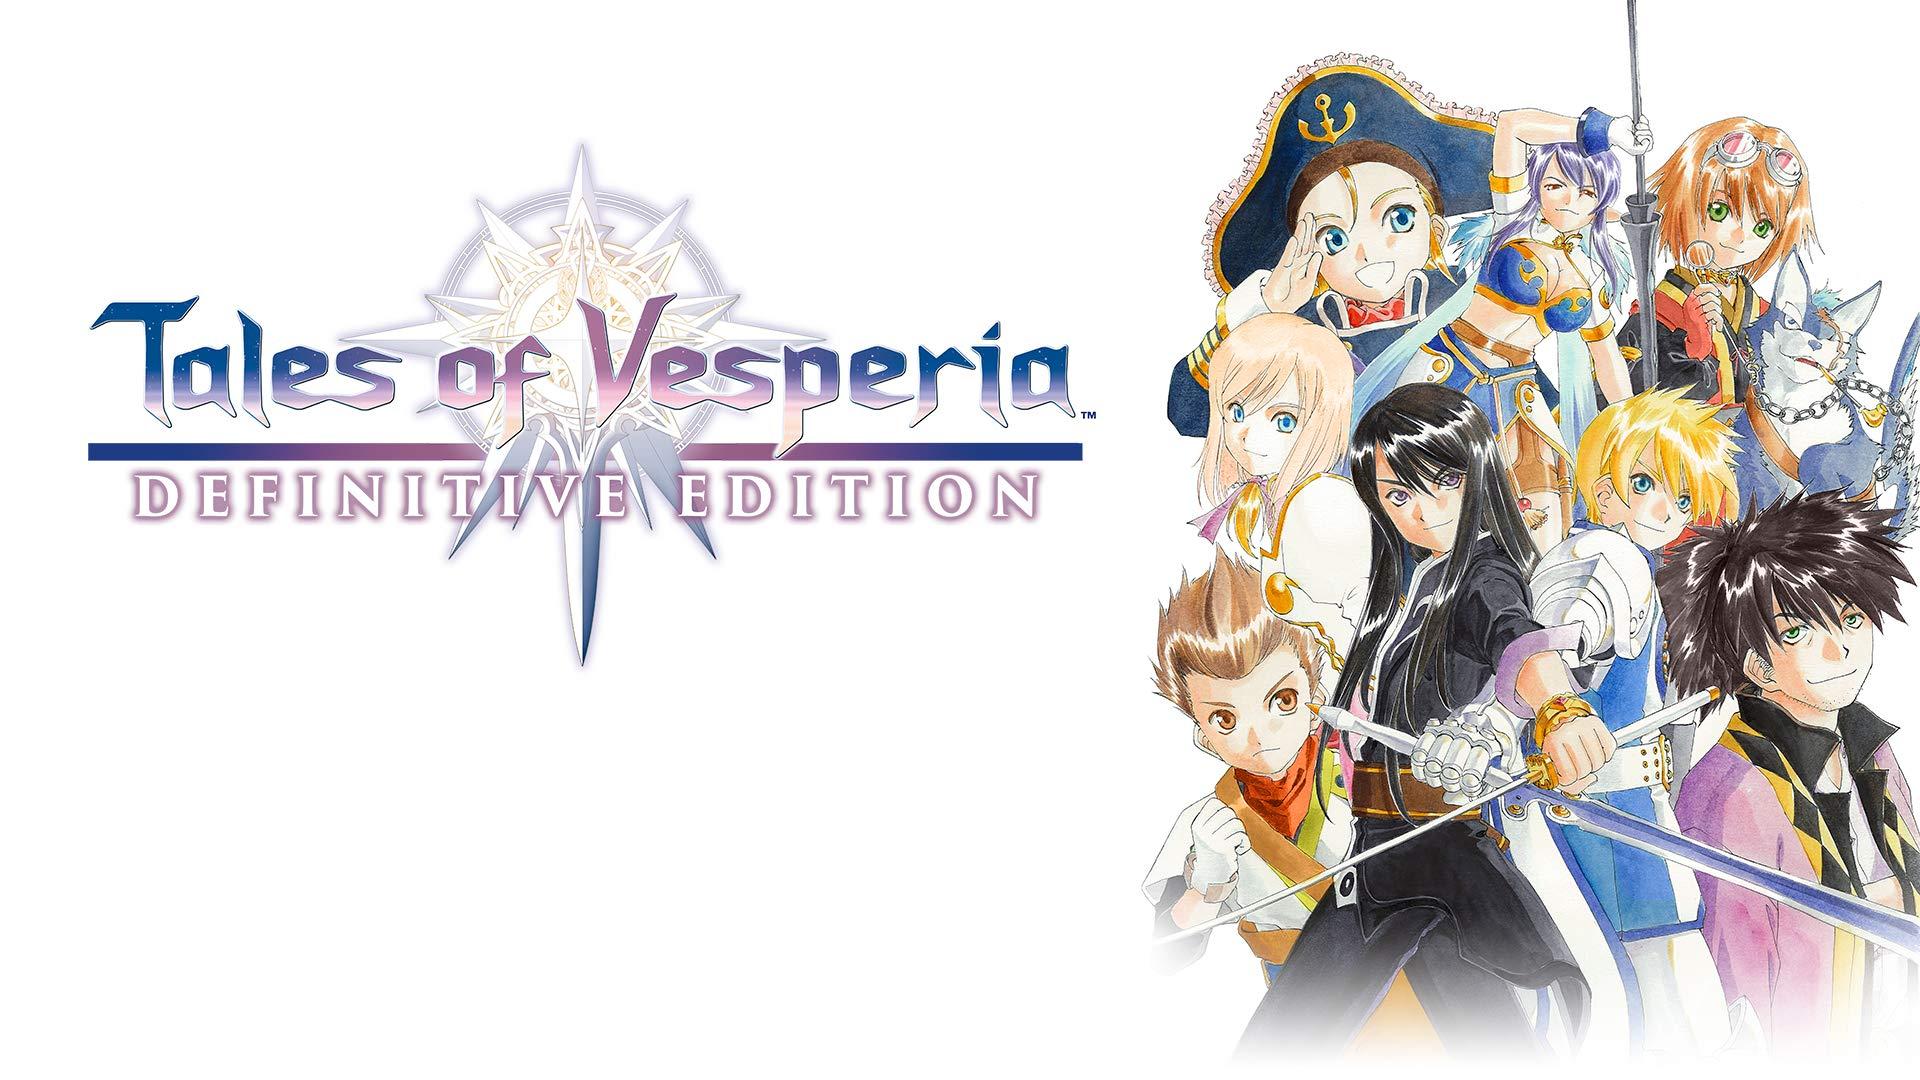 Tales of Vesperia: Definitive Edition - Nintendo Switch [Digital Code]